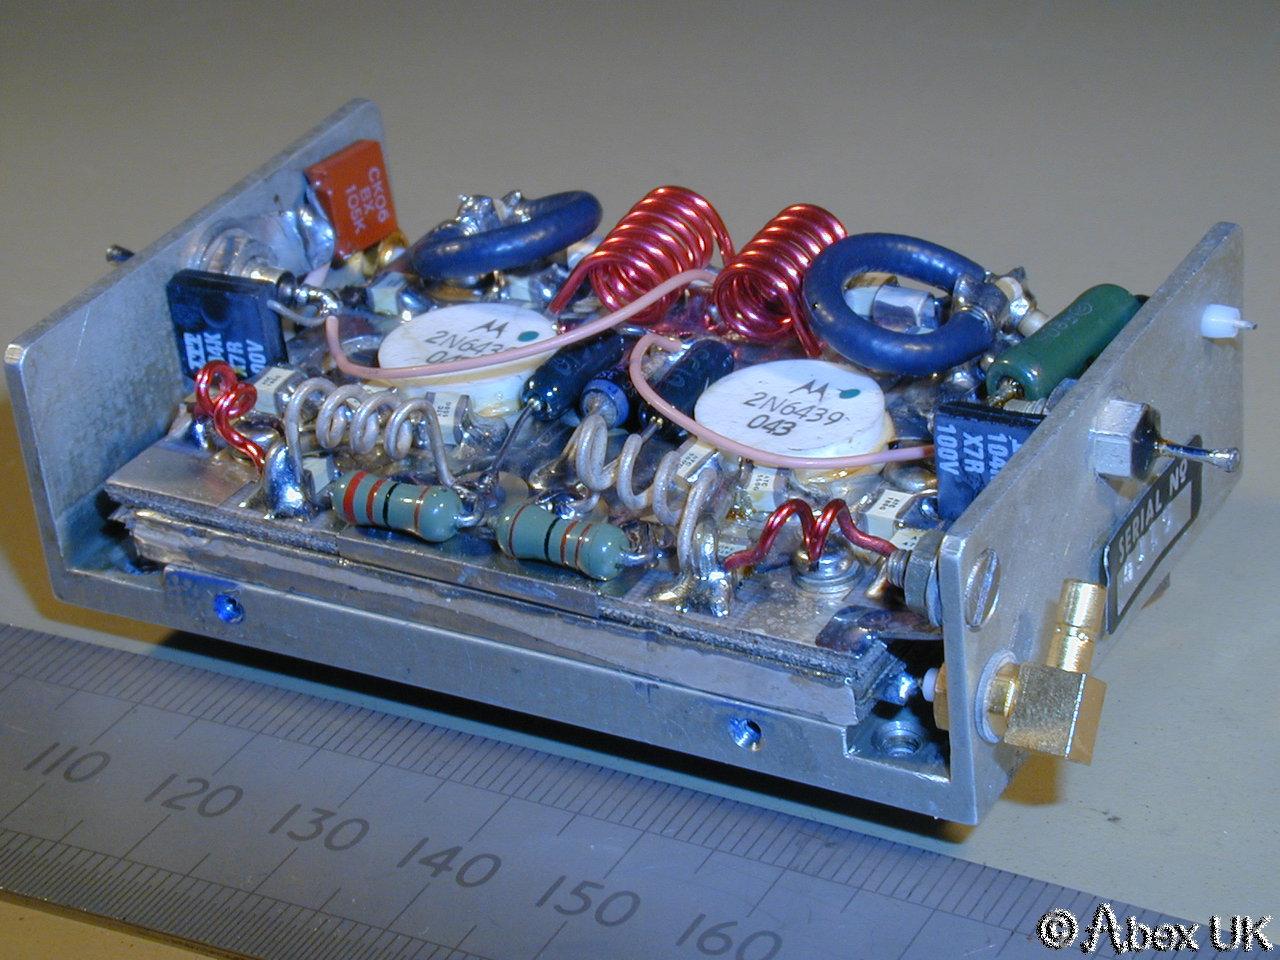 Plessey Pla100s Tiny Rf Power Amplifier Uhf 225 400mhz